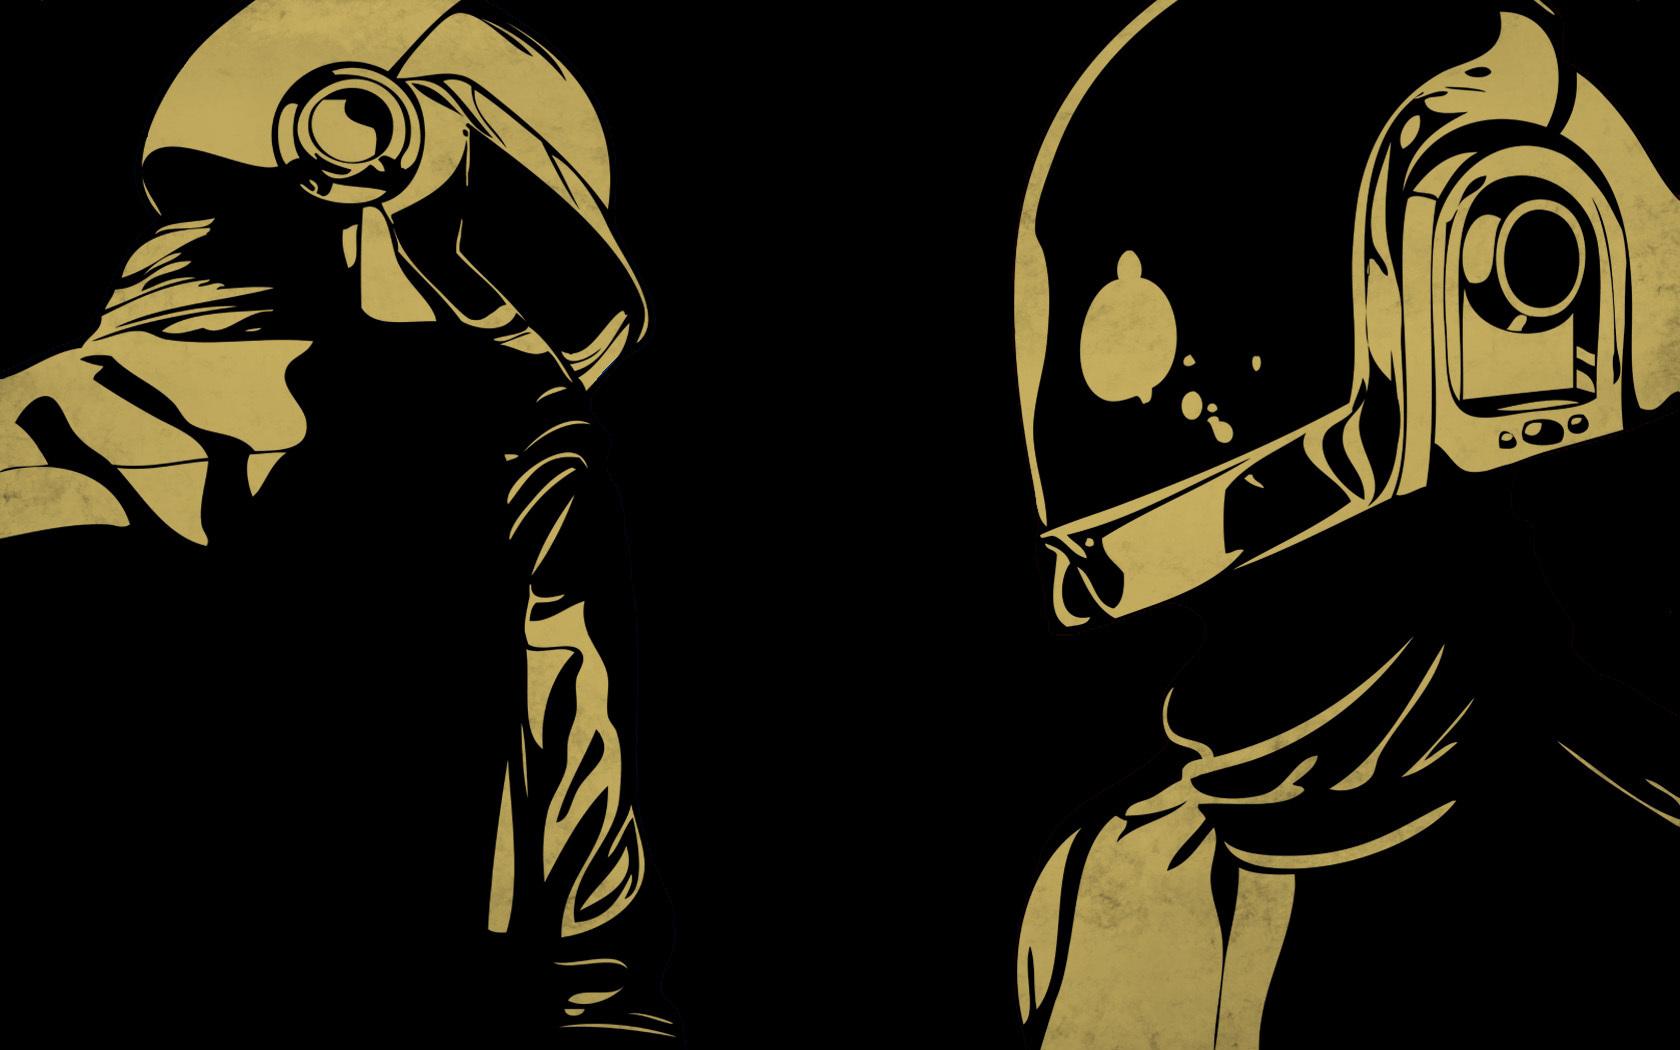 Daft Punk Daft Punk